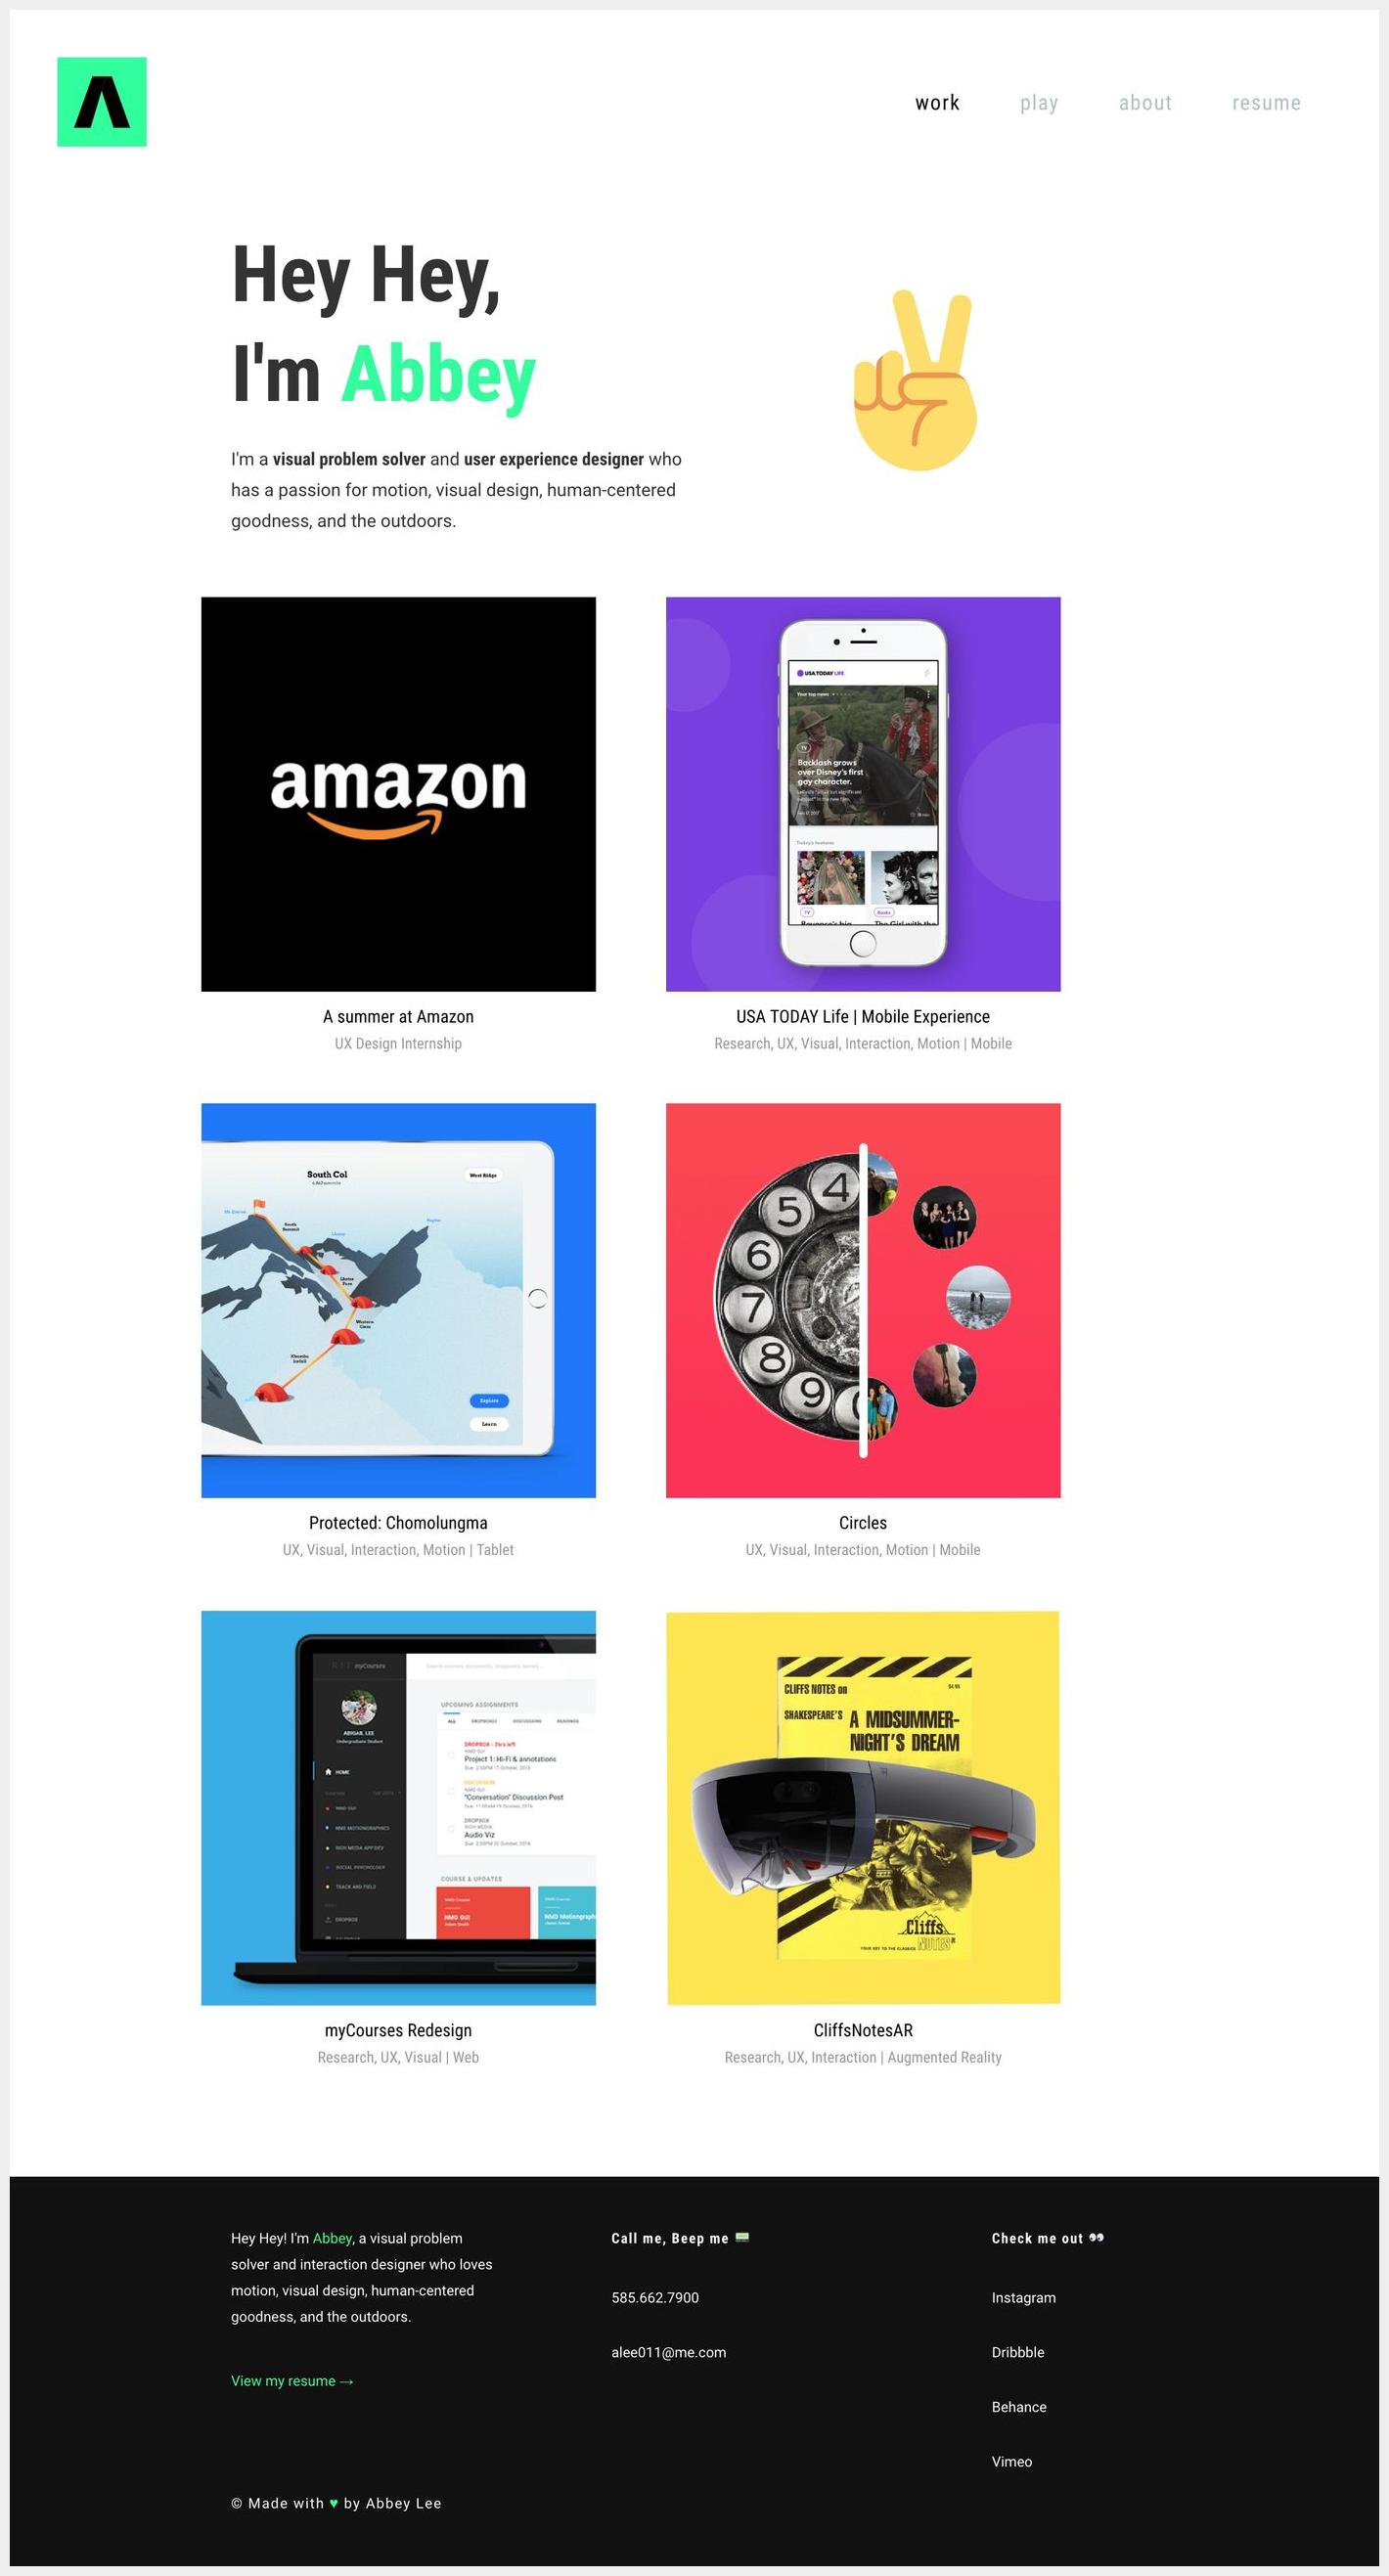 6 Awesome Portfolio Websites By Amazon Designers In 2020 Portfolio Web Design Portfolio Website Portfolio Website Inspiration